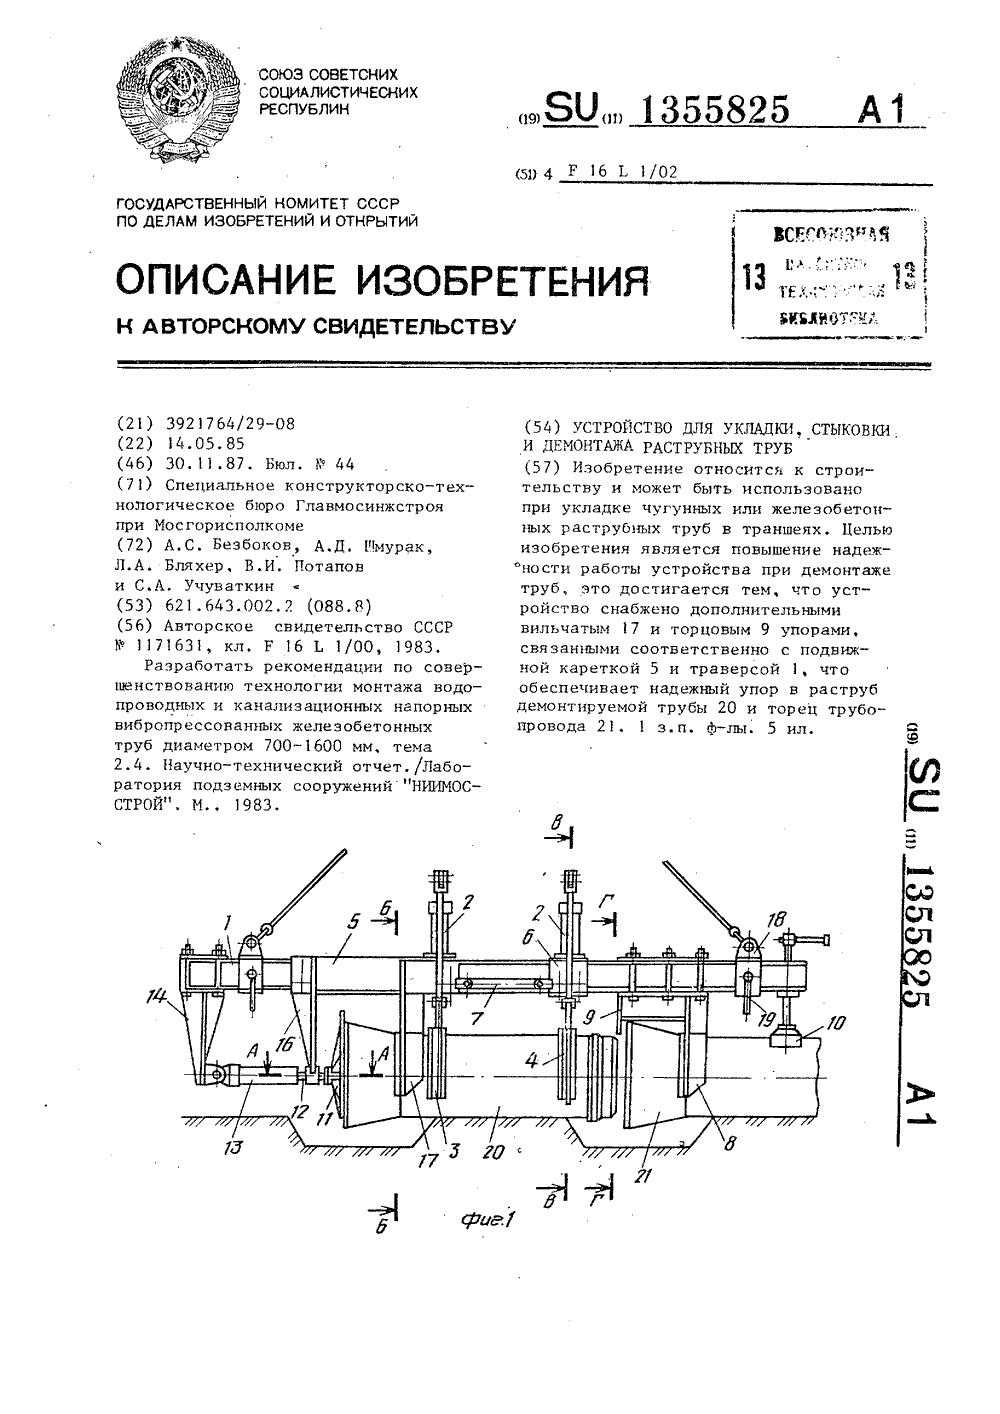 Охрана труда при демонтаже металлоконструкций